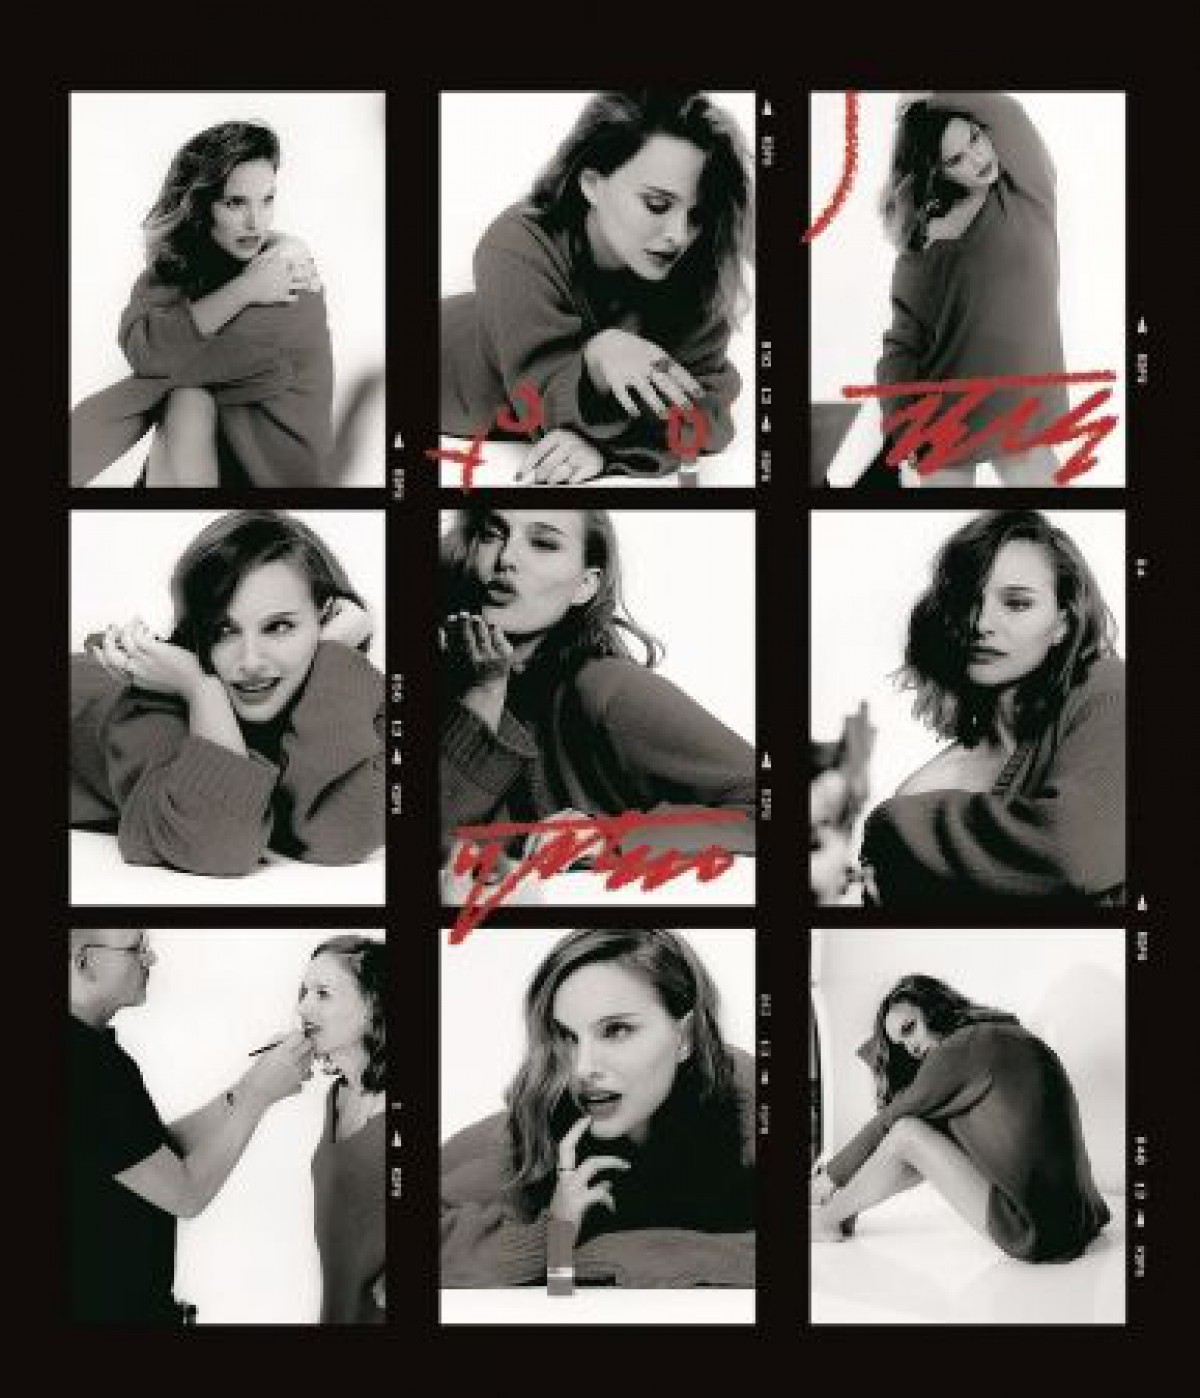 Dior新作リップが先行発売!伊勢丹新宿店だけの激レアイベントをチェック♡